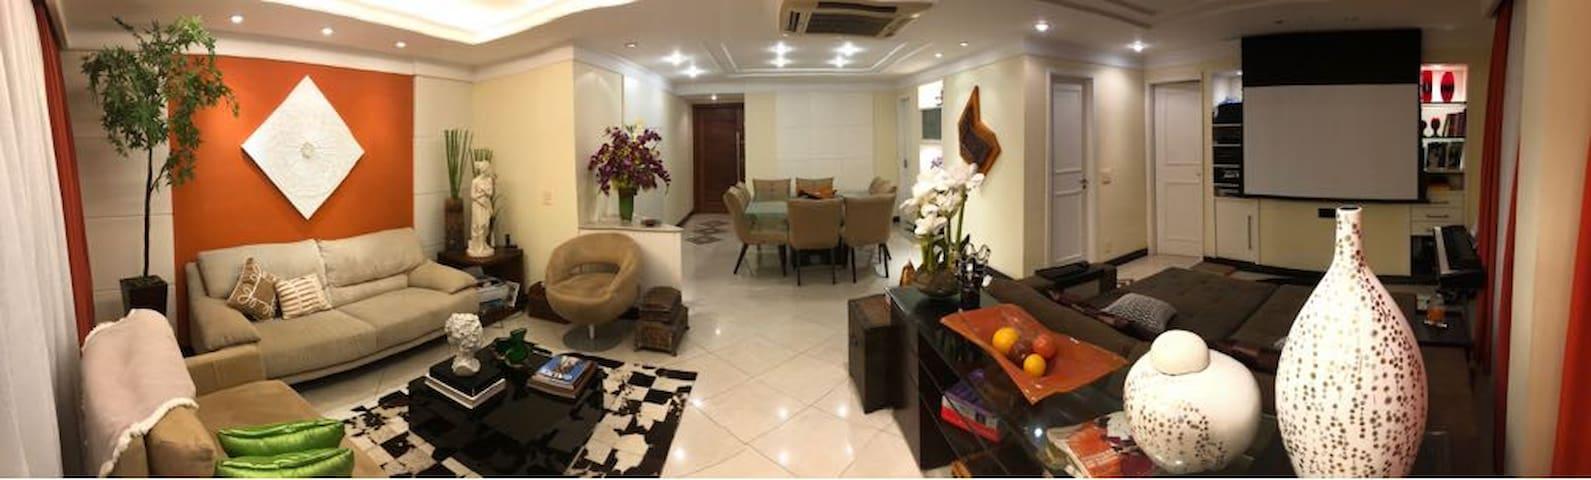 Apartamento 150 m2 perto da praia